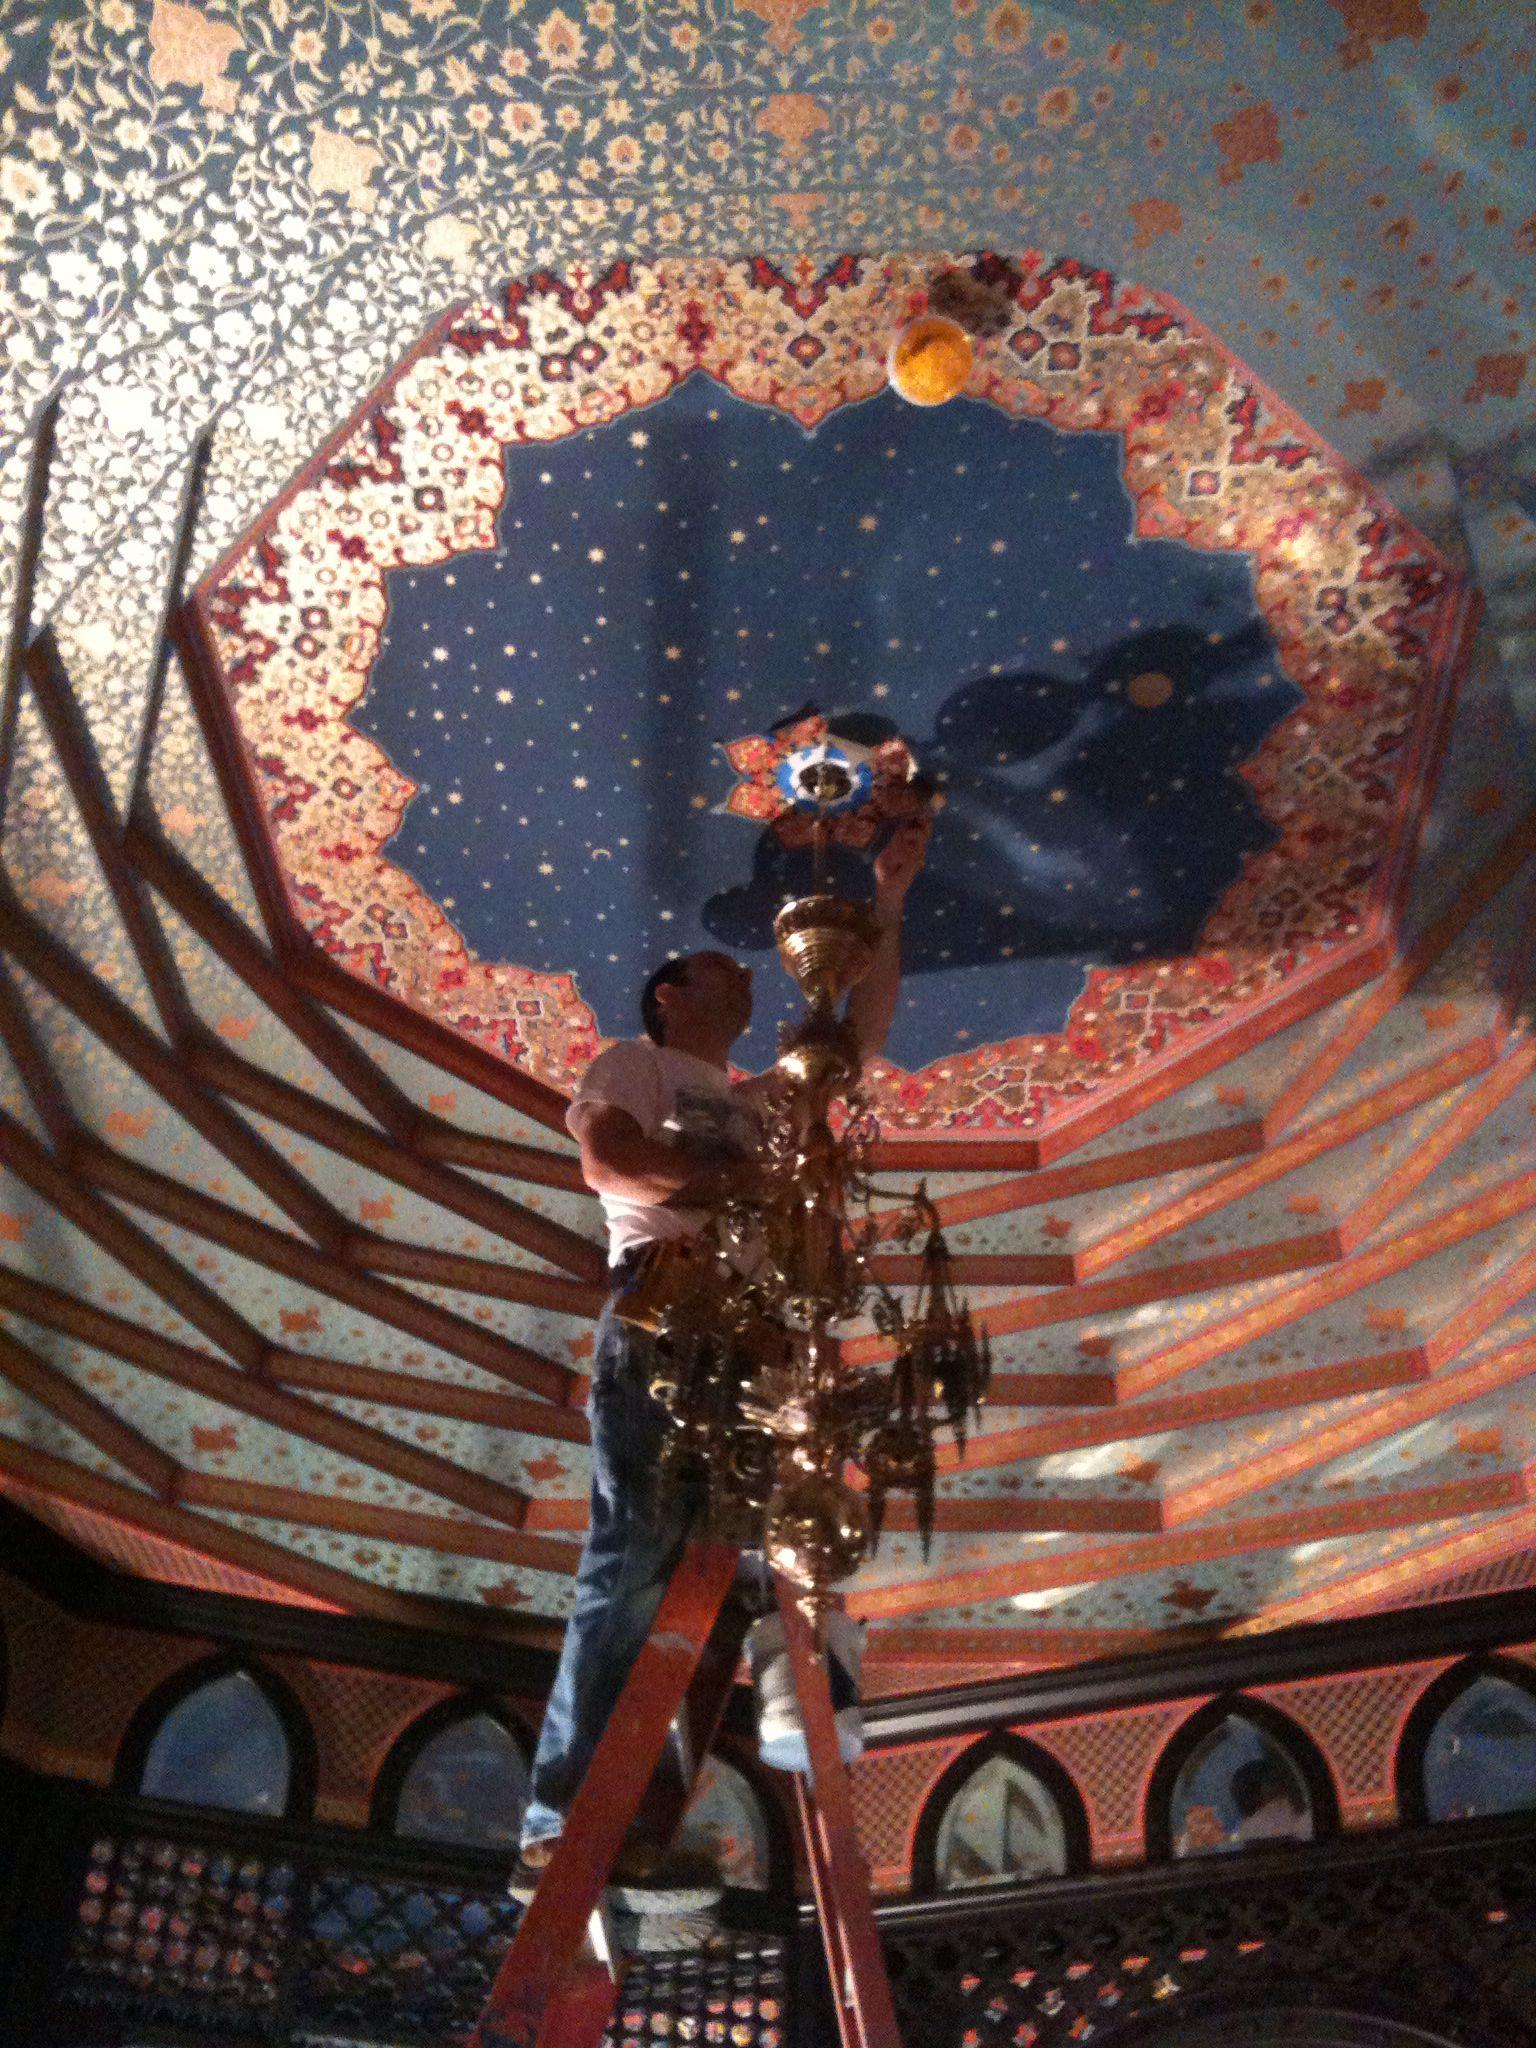 Bradbury wallpaper installed on a stepped ceiling Heidi Wright